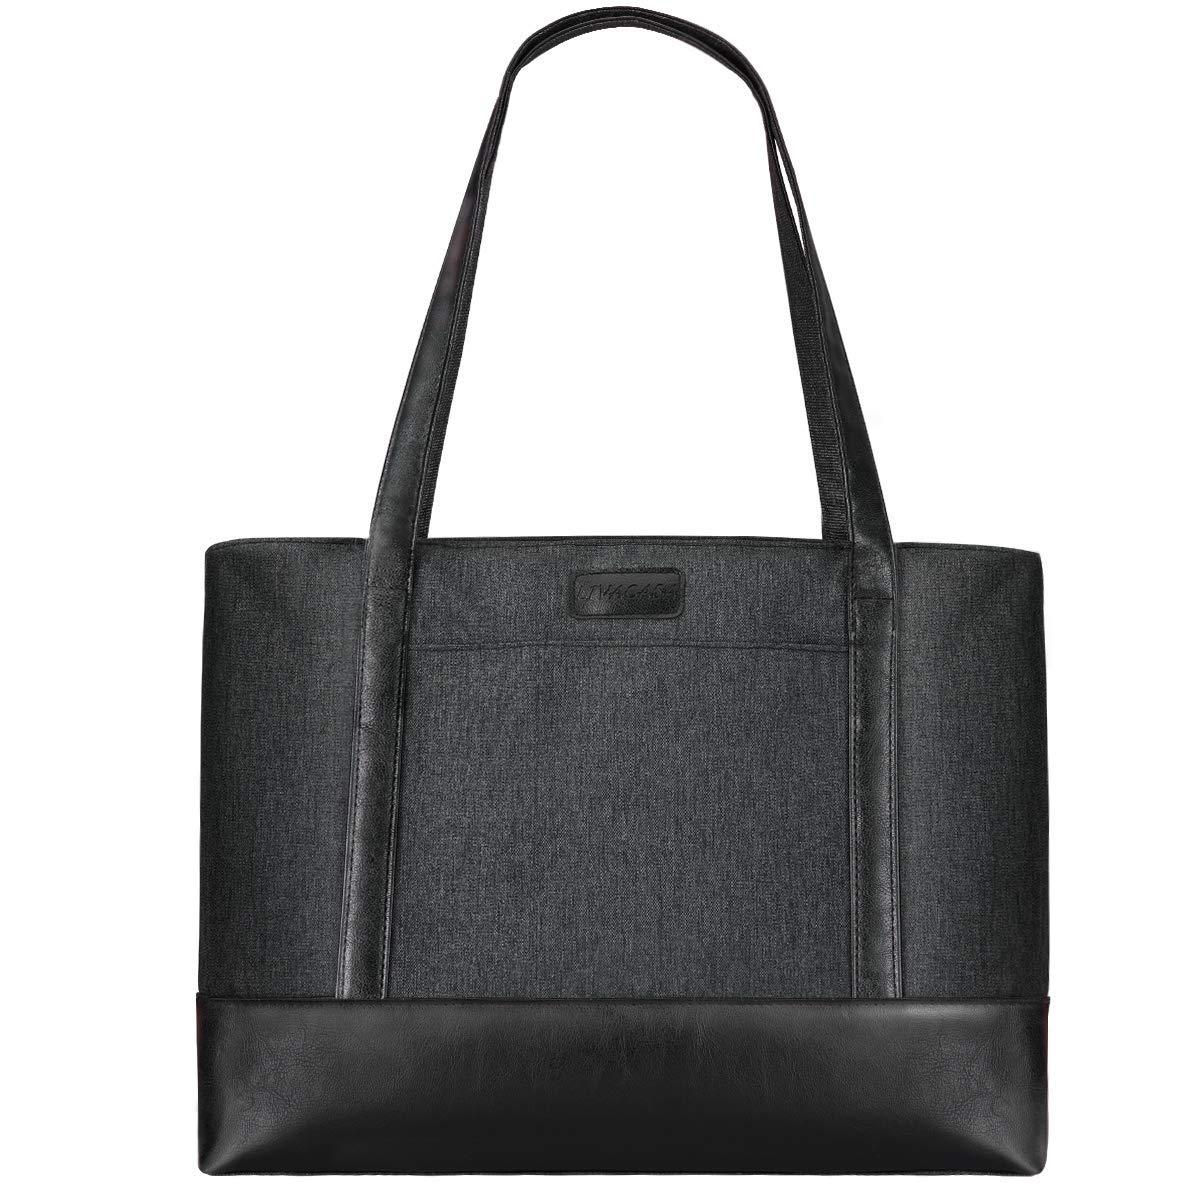 LIVACASA Laptop Tote Bag Women Fits 15.6 Inch Shoulder Bag Water Resistant Lightweight PU leather Multi Use Stylish Handbag